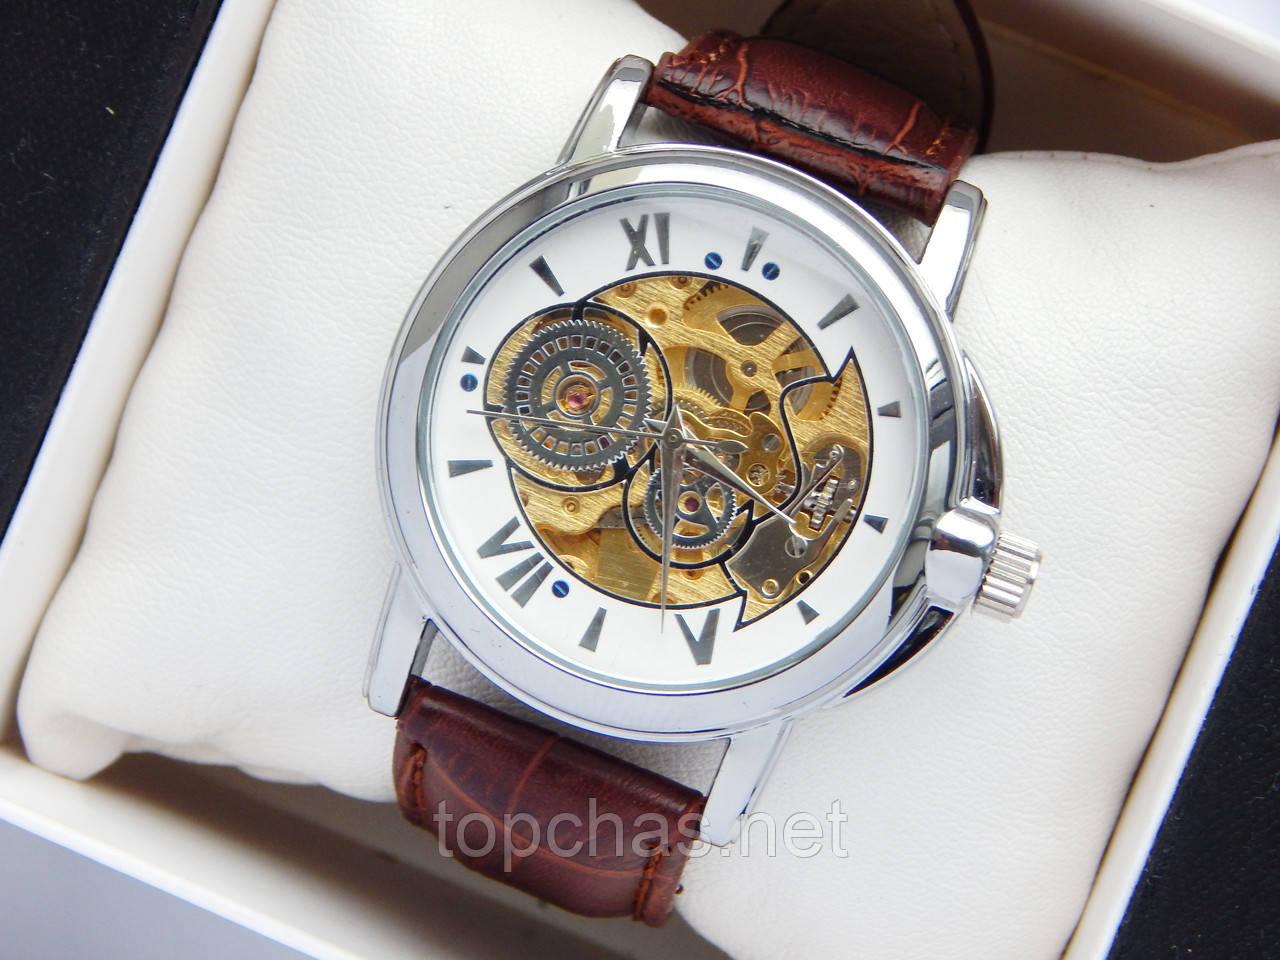 Мужские механические часы скелетоны, римские цифры, шестерни, на циферблате  - Top Chas - e9b6c1ee395